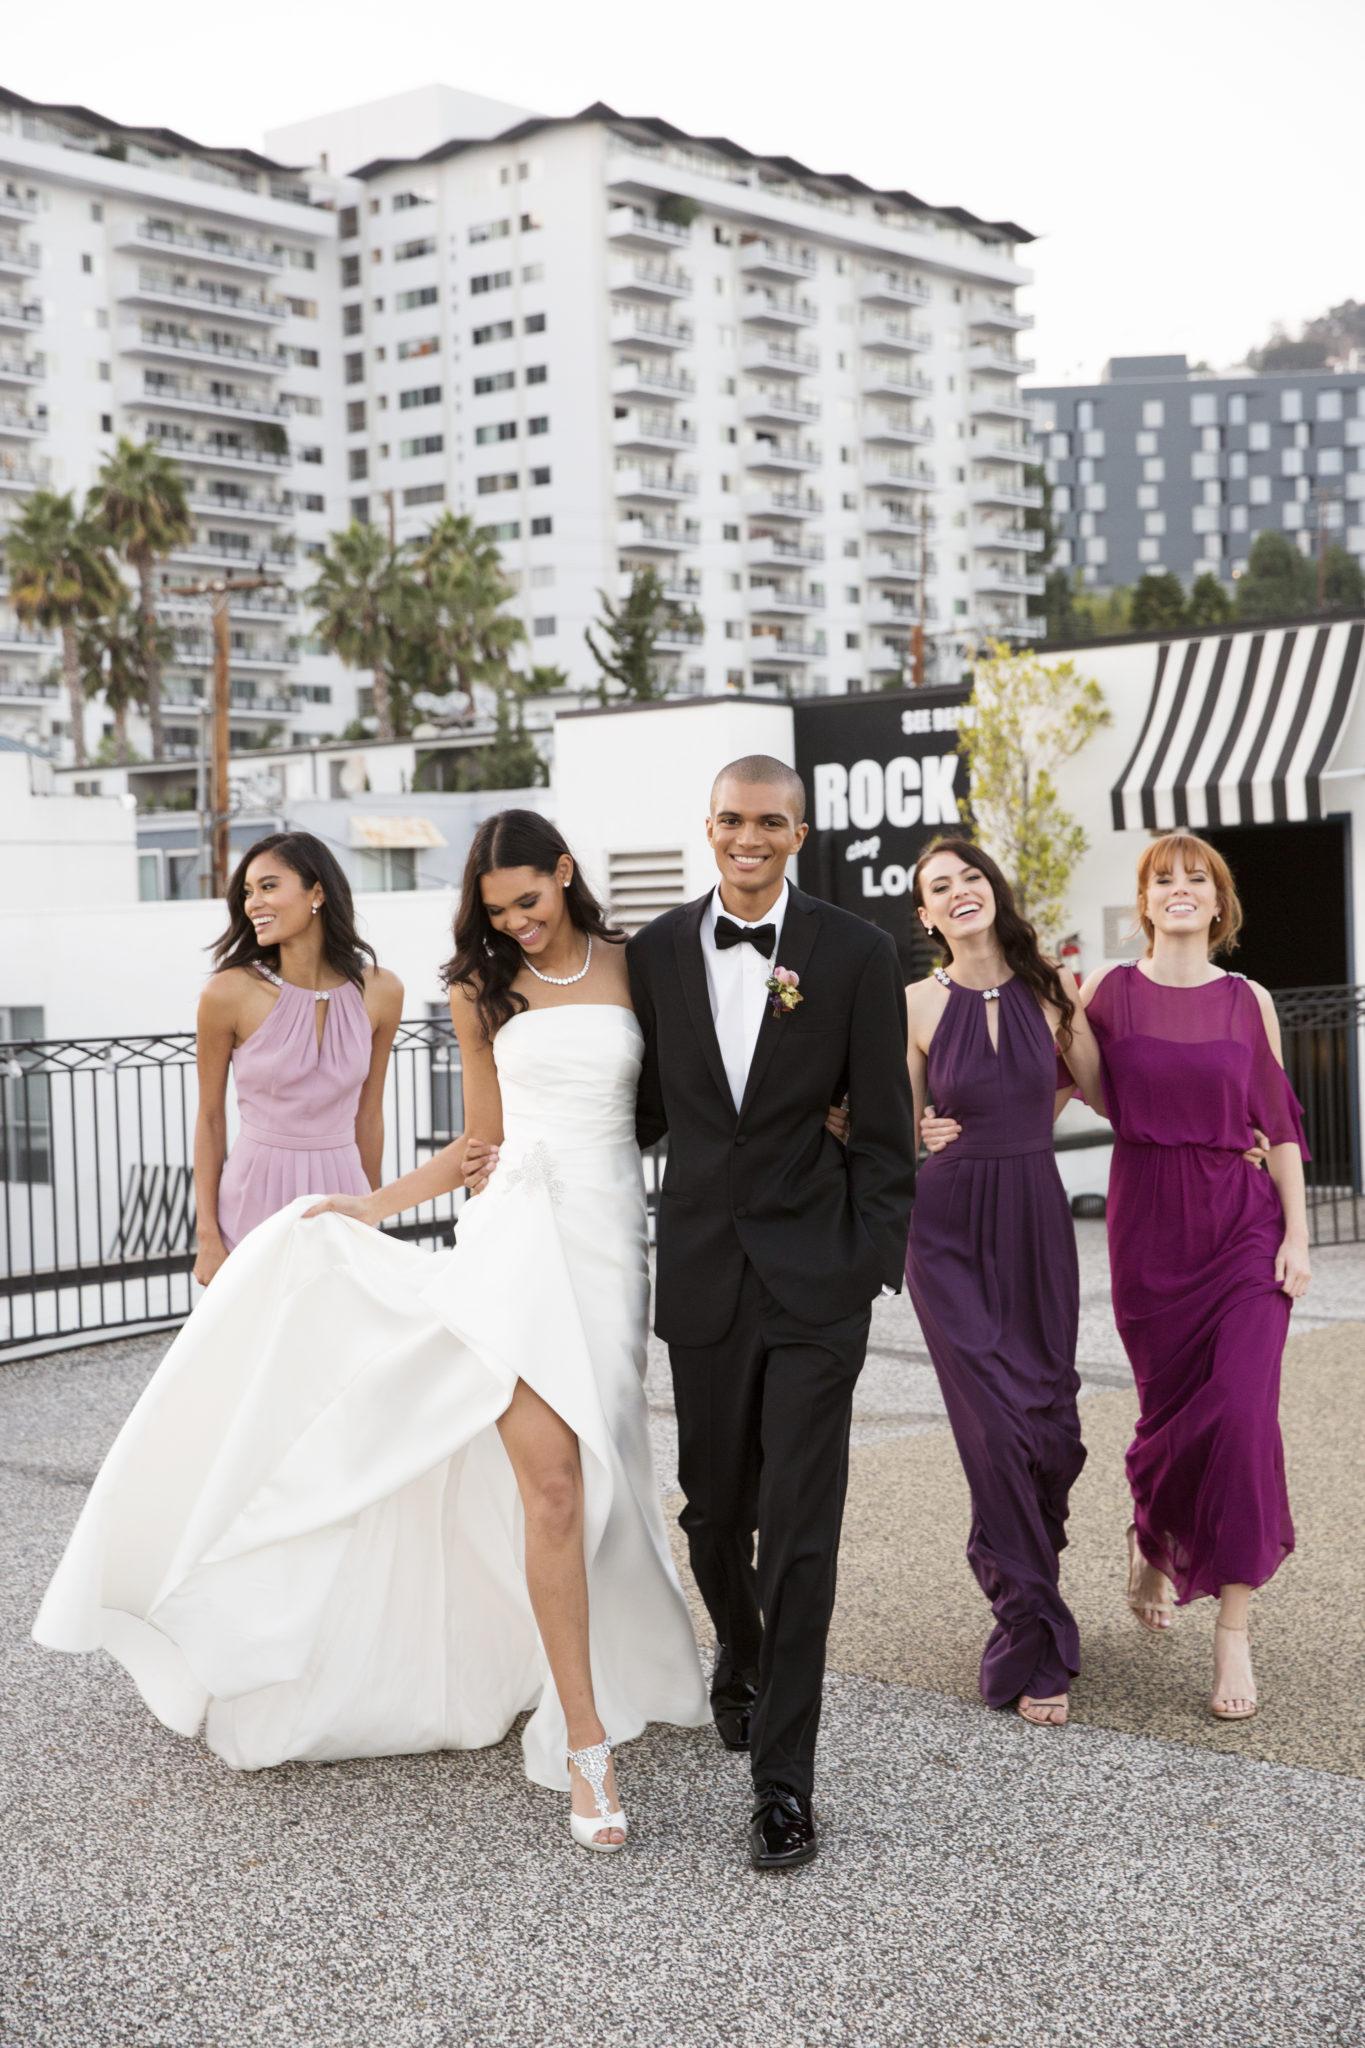 Glamorous wedding party on LA roof